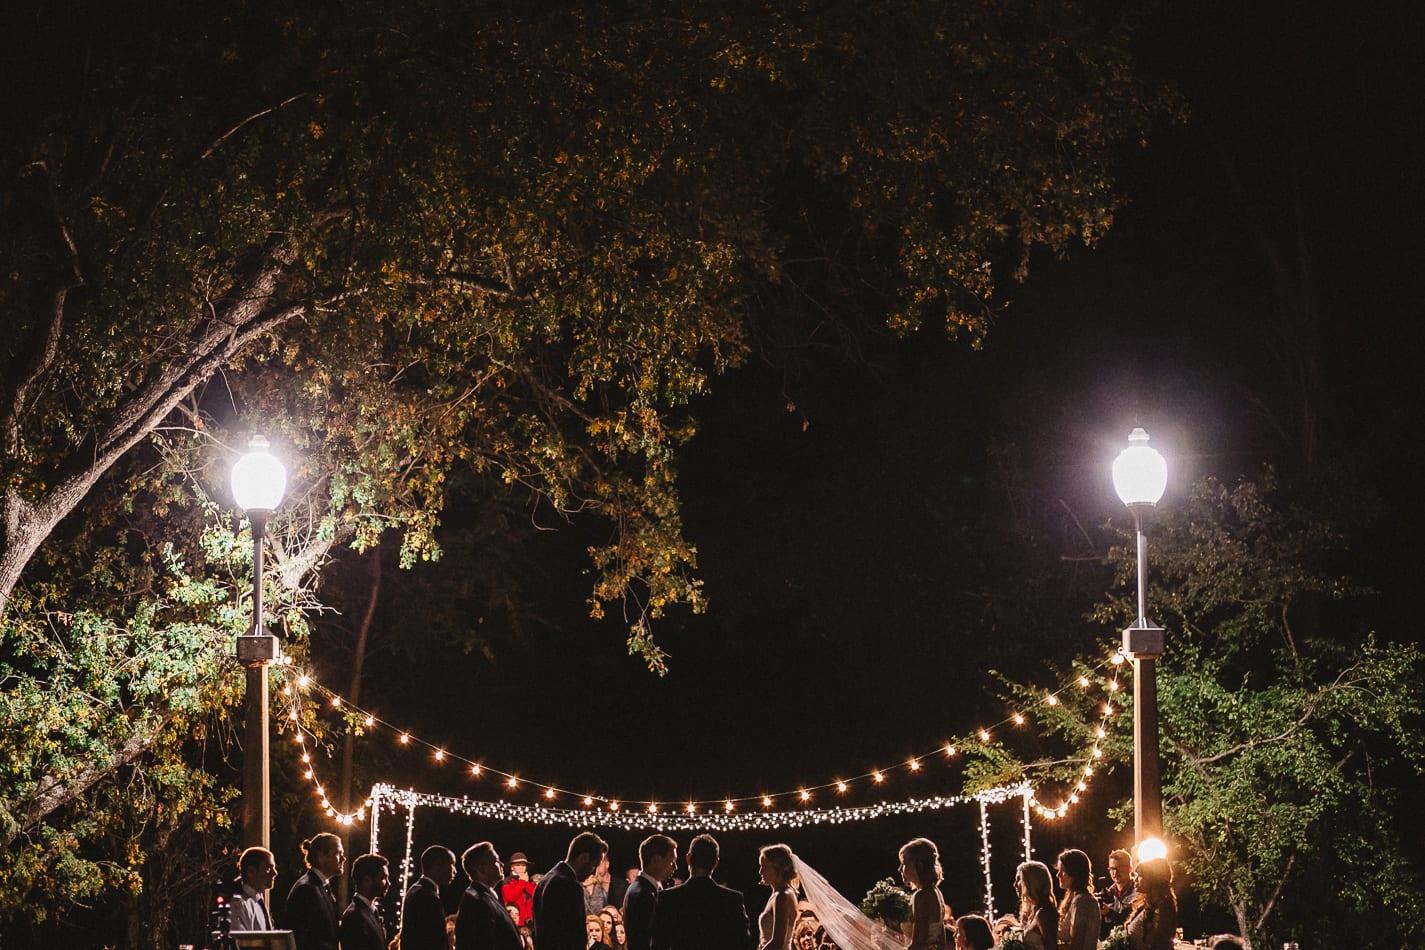 lake-redding-park-diesel-horse-bridge-view202-california-wedding-photographer-19